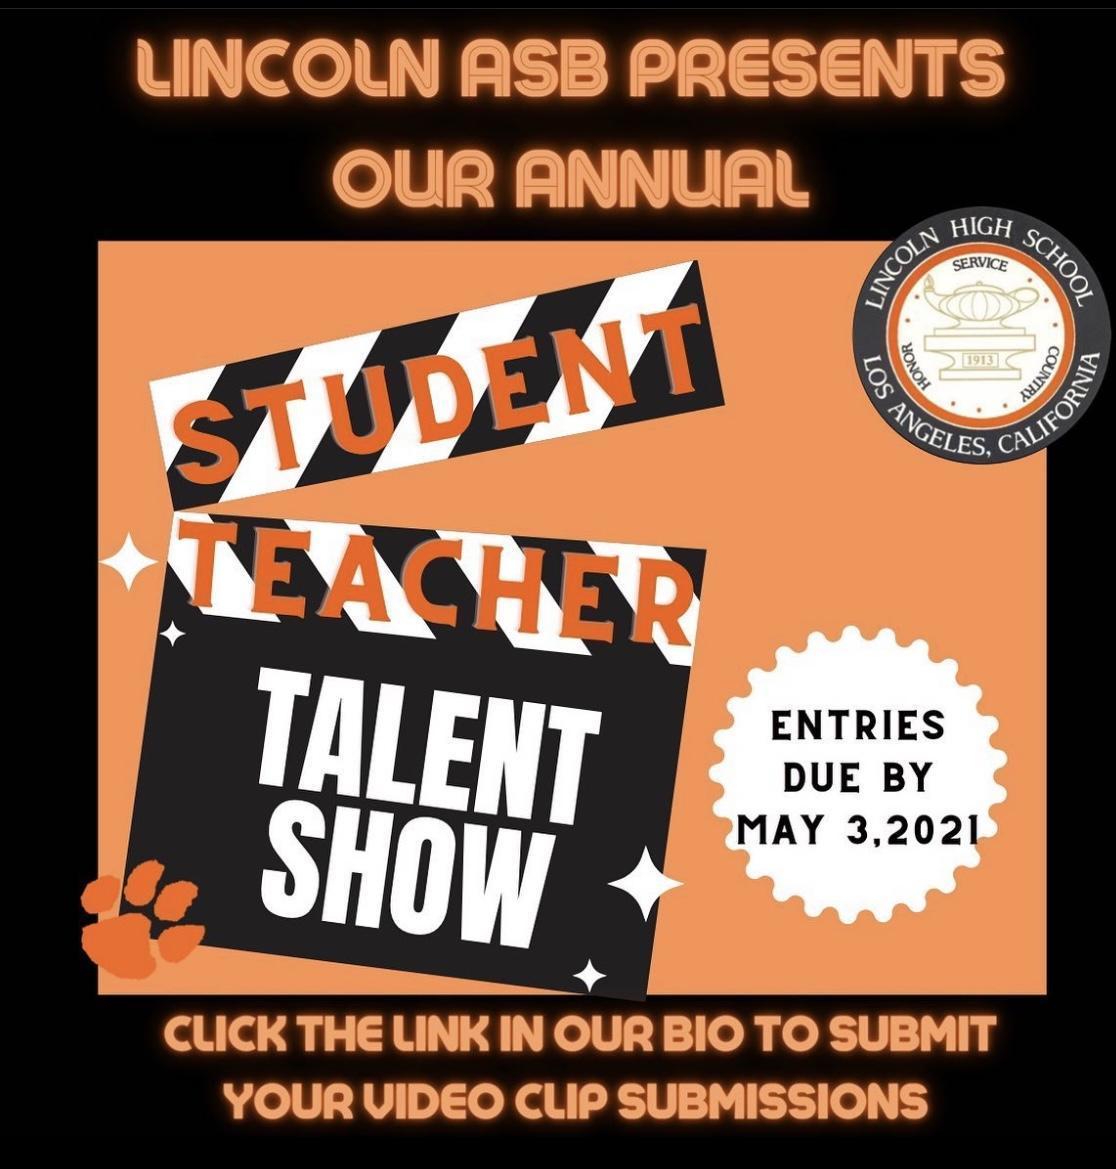 ASB Leadership Student-Teacher Talent Show